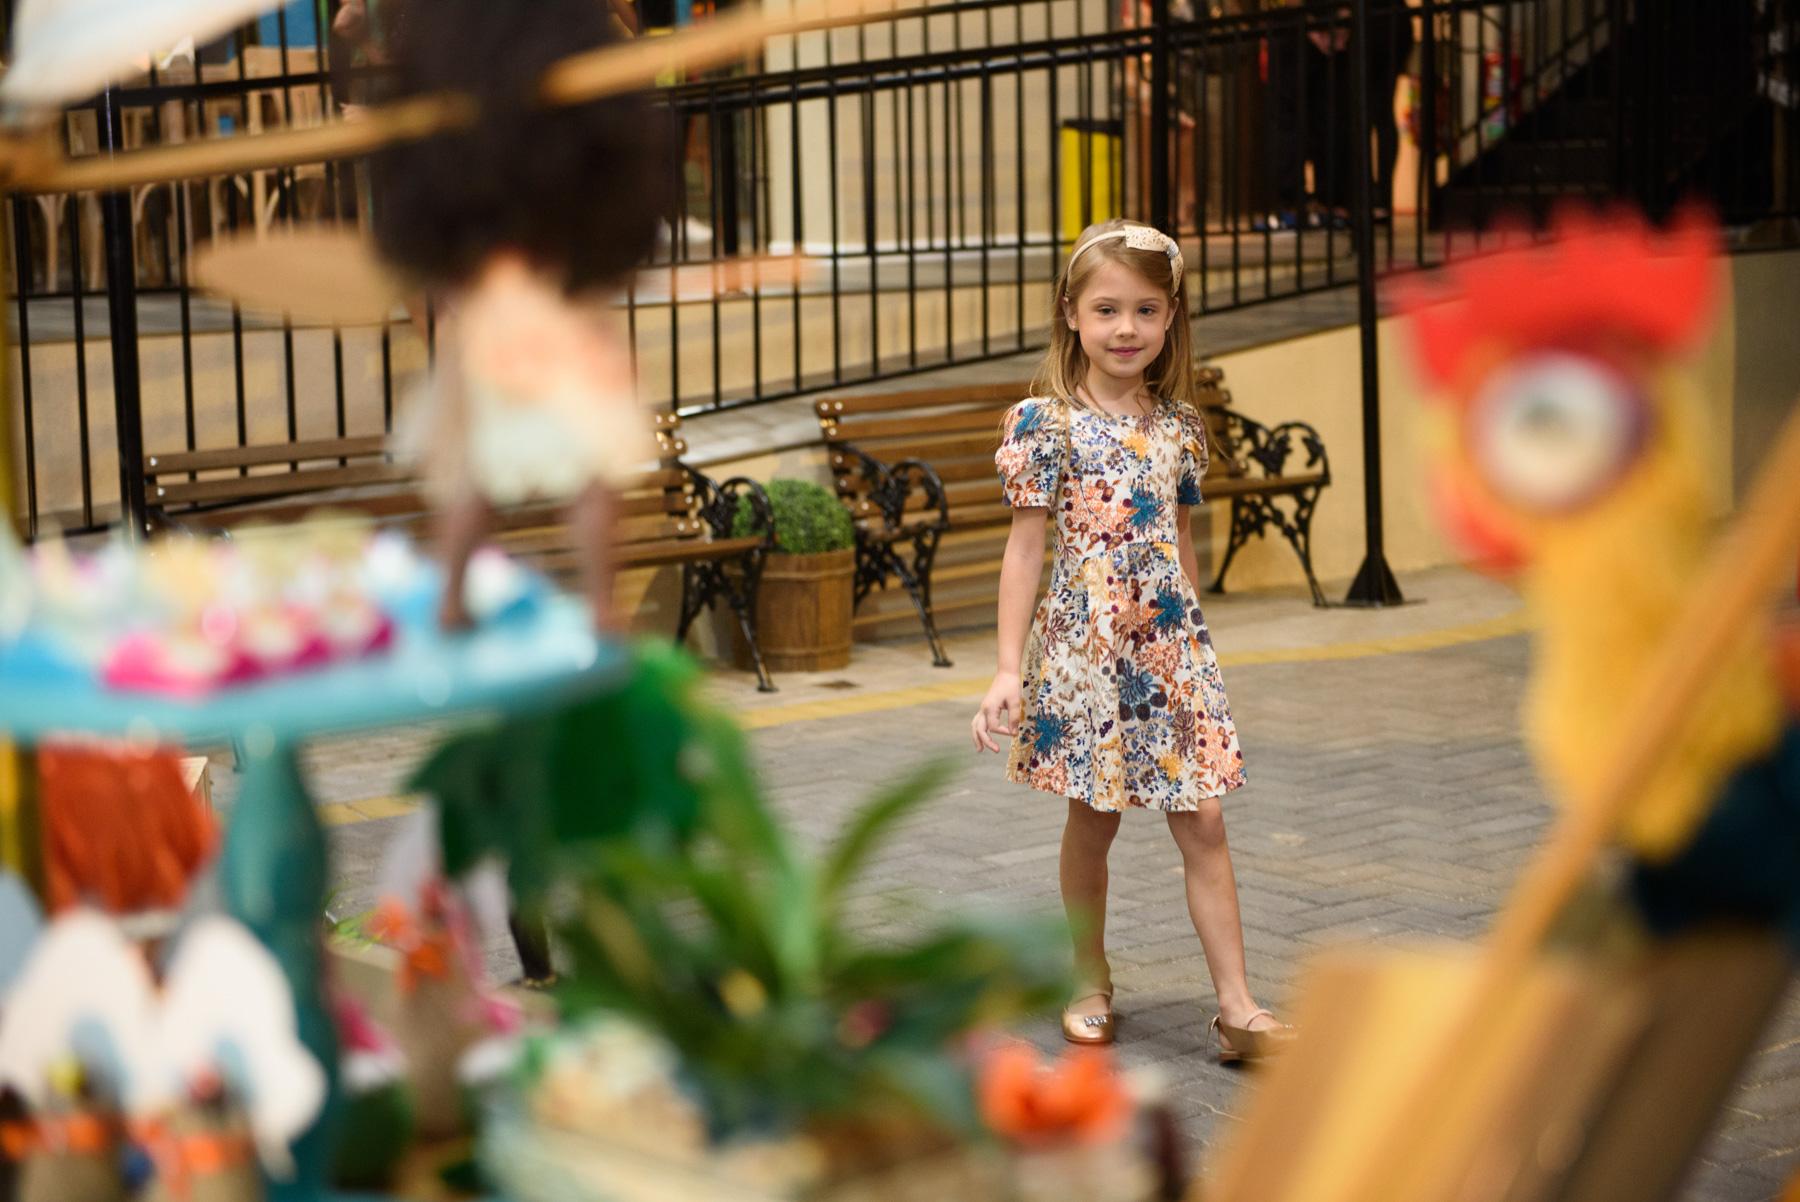 002_fotografia-aniversario-infantil-moana-curitiba-buffet-brigadeiro-guswanderley.jpg